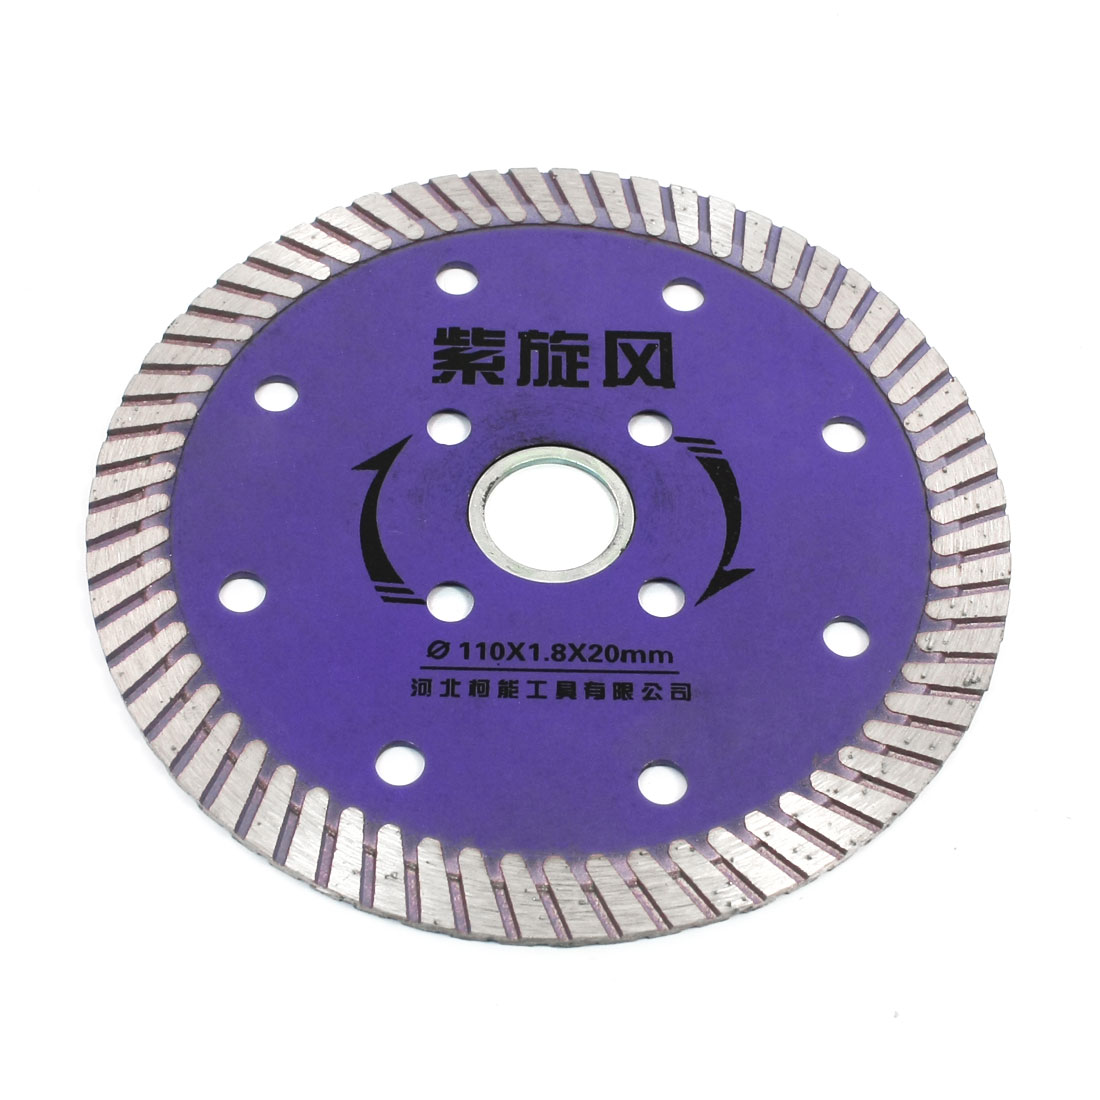 Purple Silver Tone 105mm Dia Sintered Diamond Saw Flake Masonry Cutting Disc